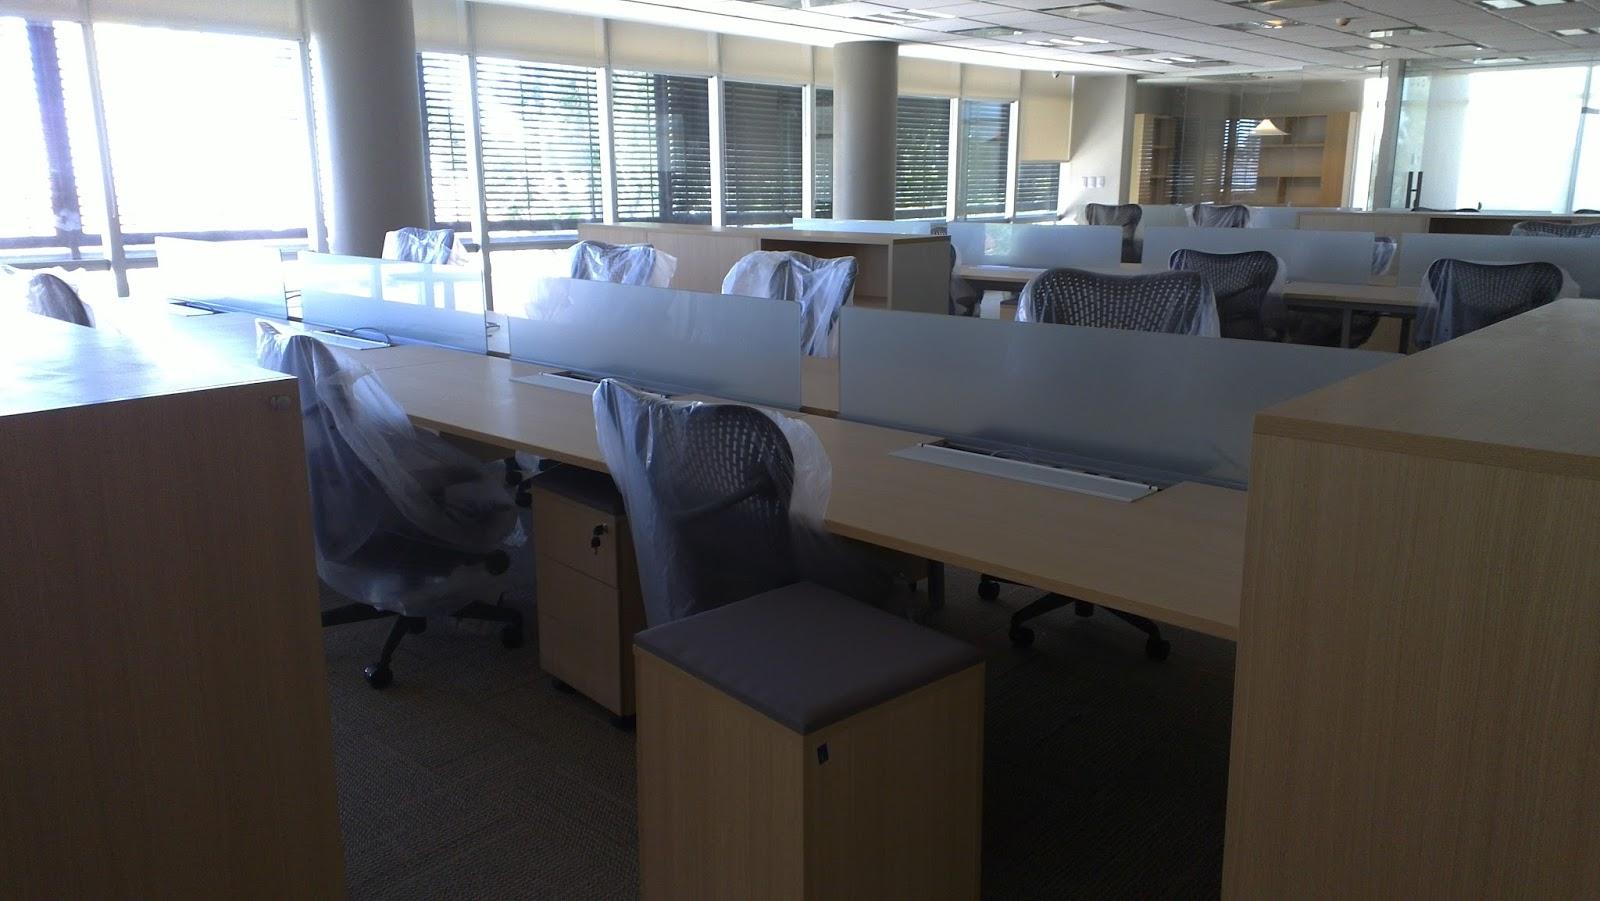 Sucarpinteriaorg muebles de oficina for Muebles de oficina 2016